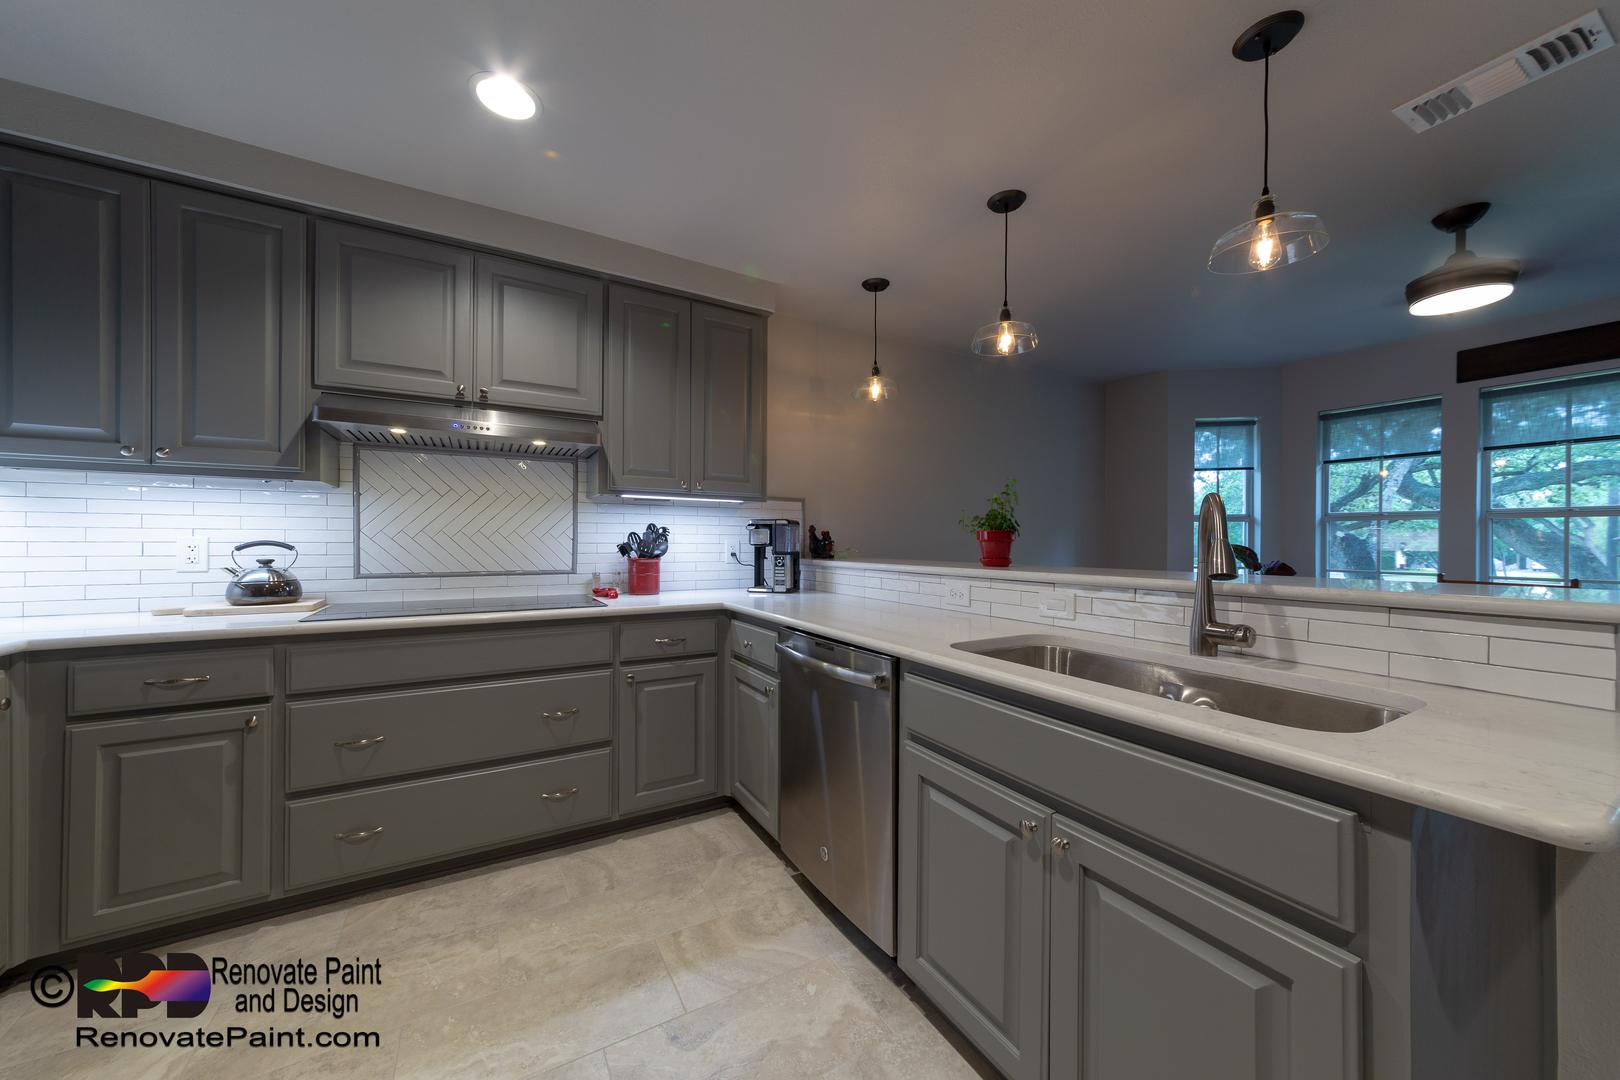 Residential Home Kitchen Remodeling San Antonio Texas